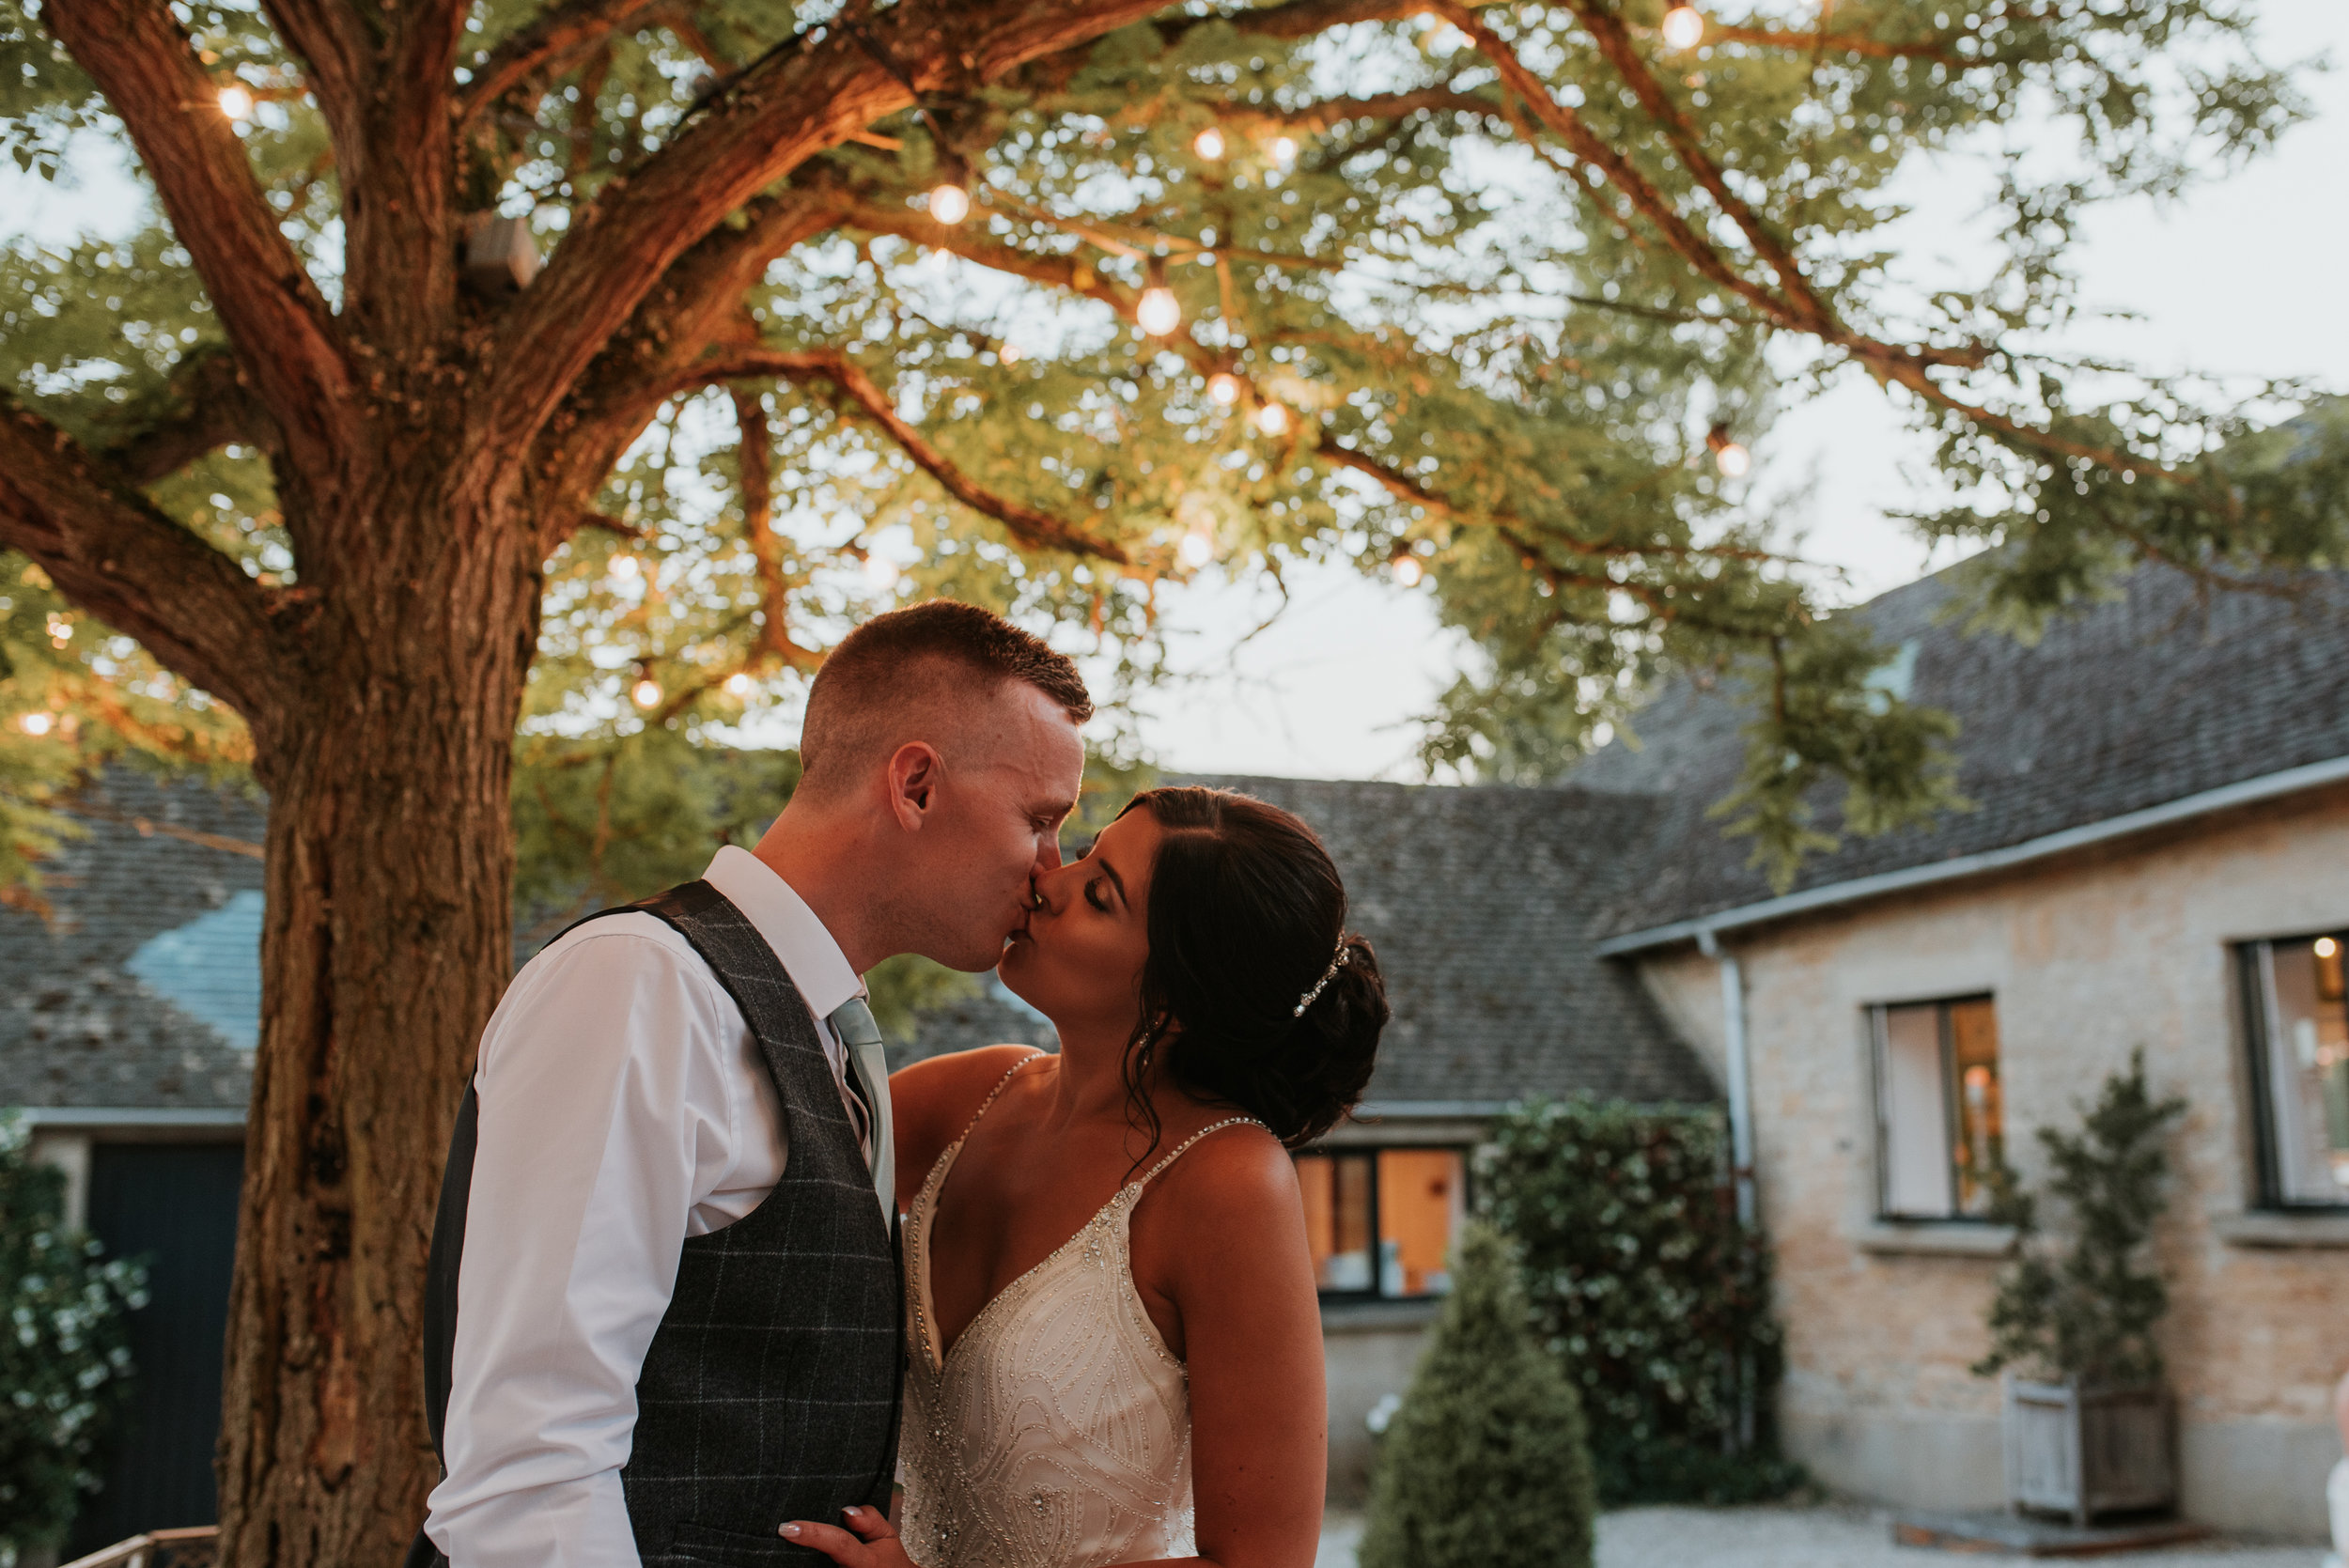 Oxfordshire-wedding-photographer-98.jpg